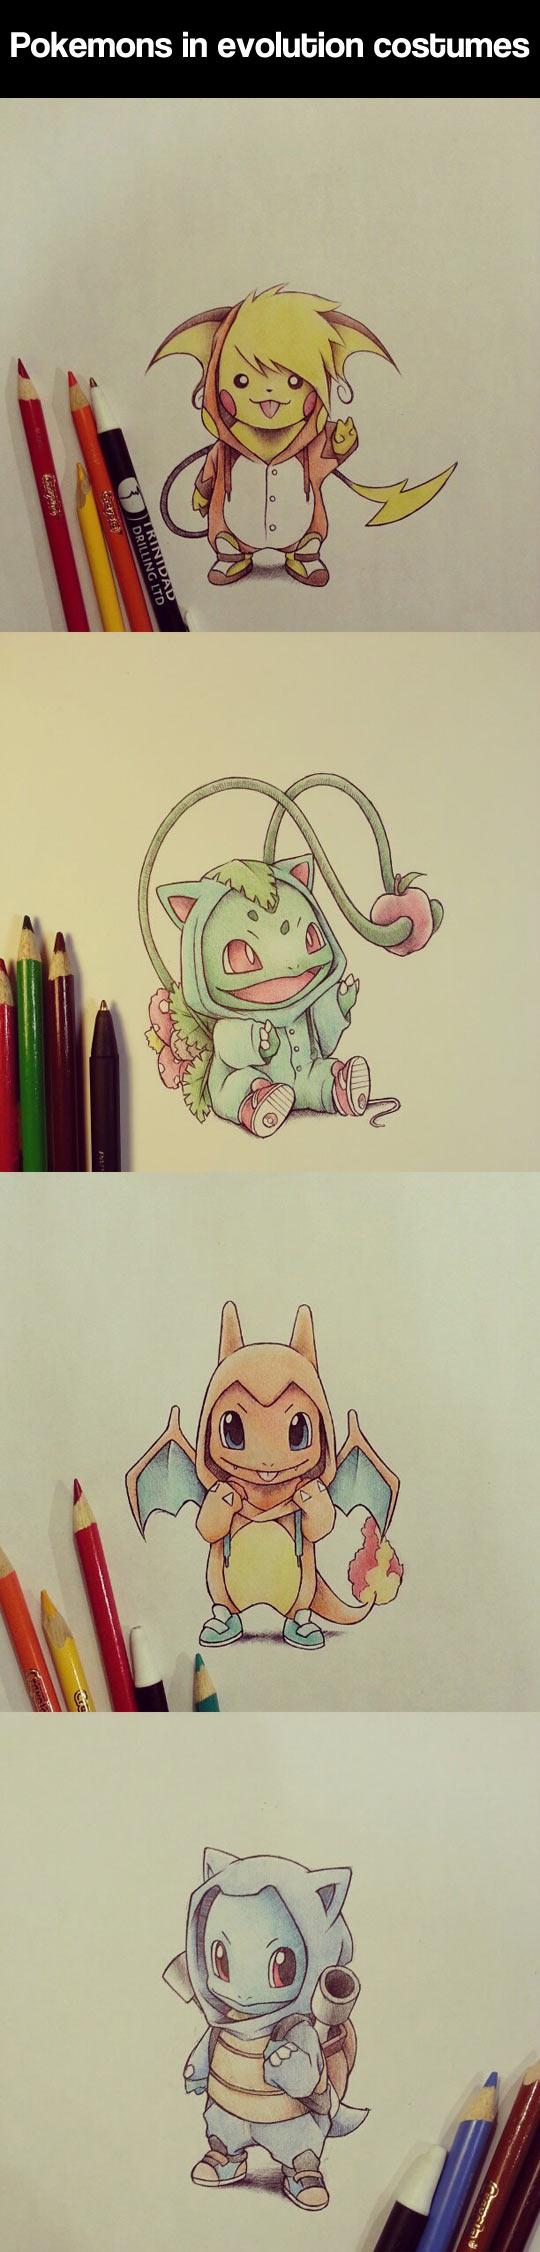 Pokemon wearing evolution costumes...